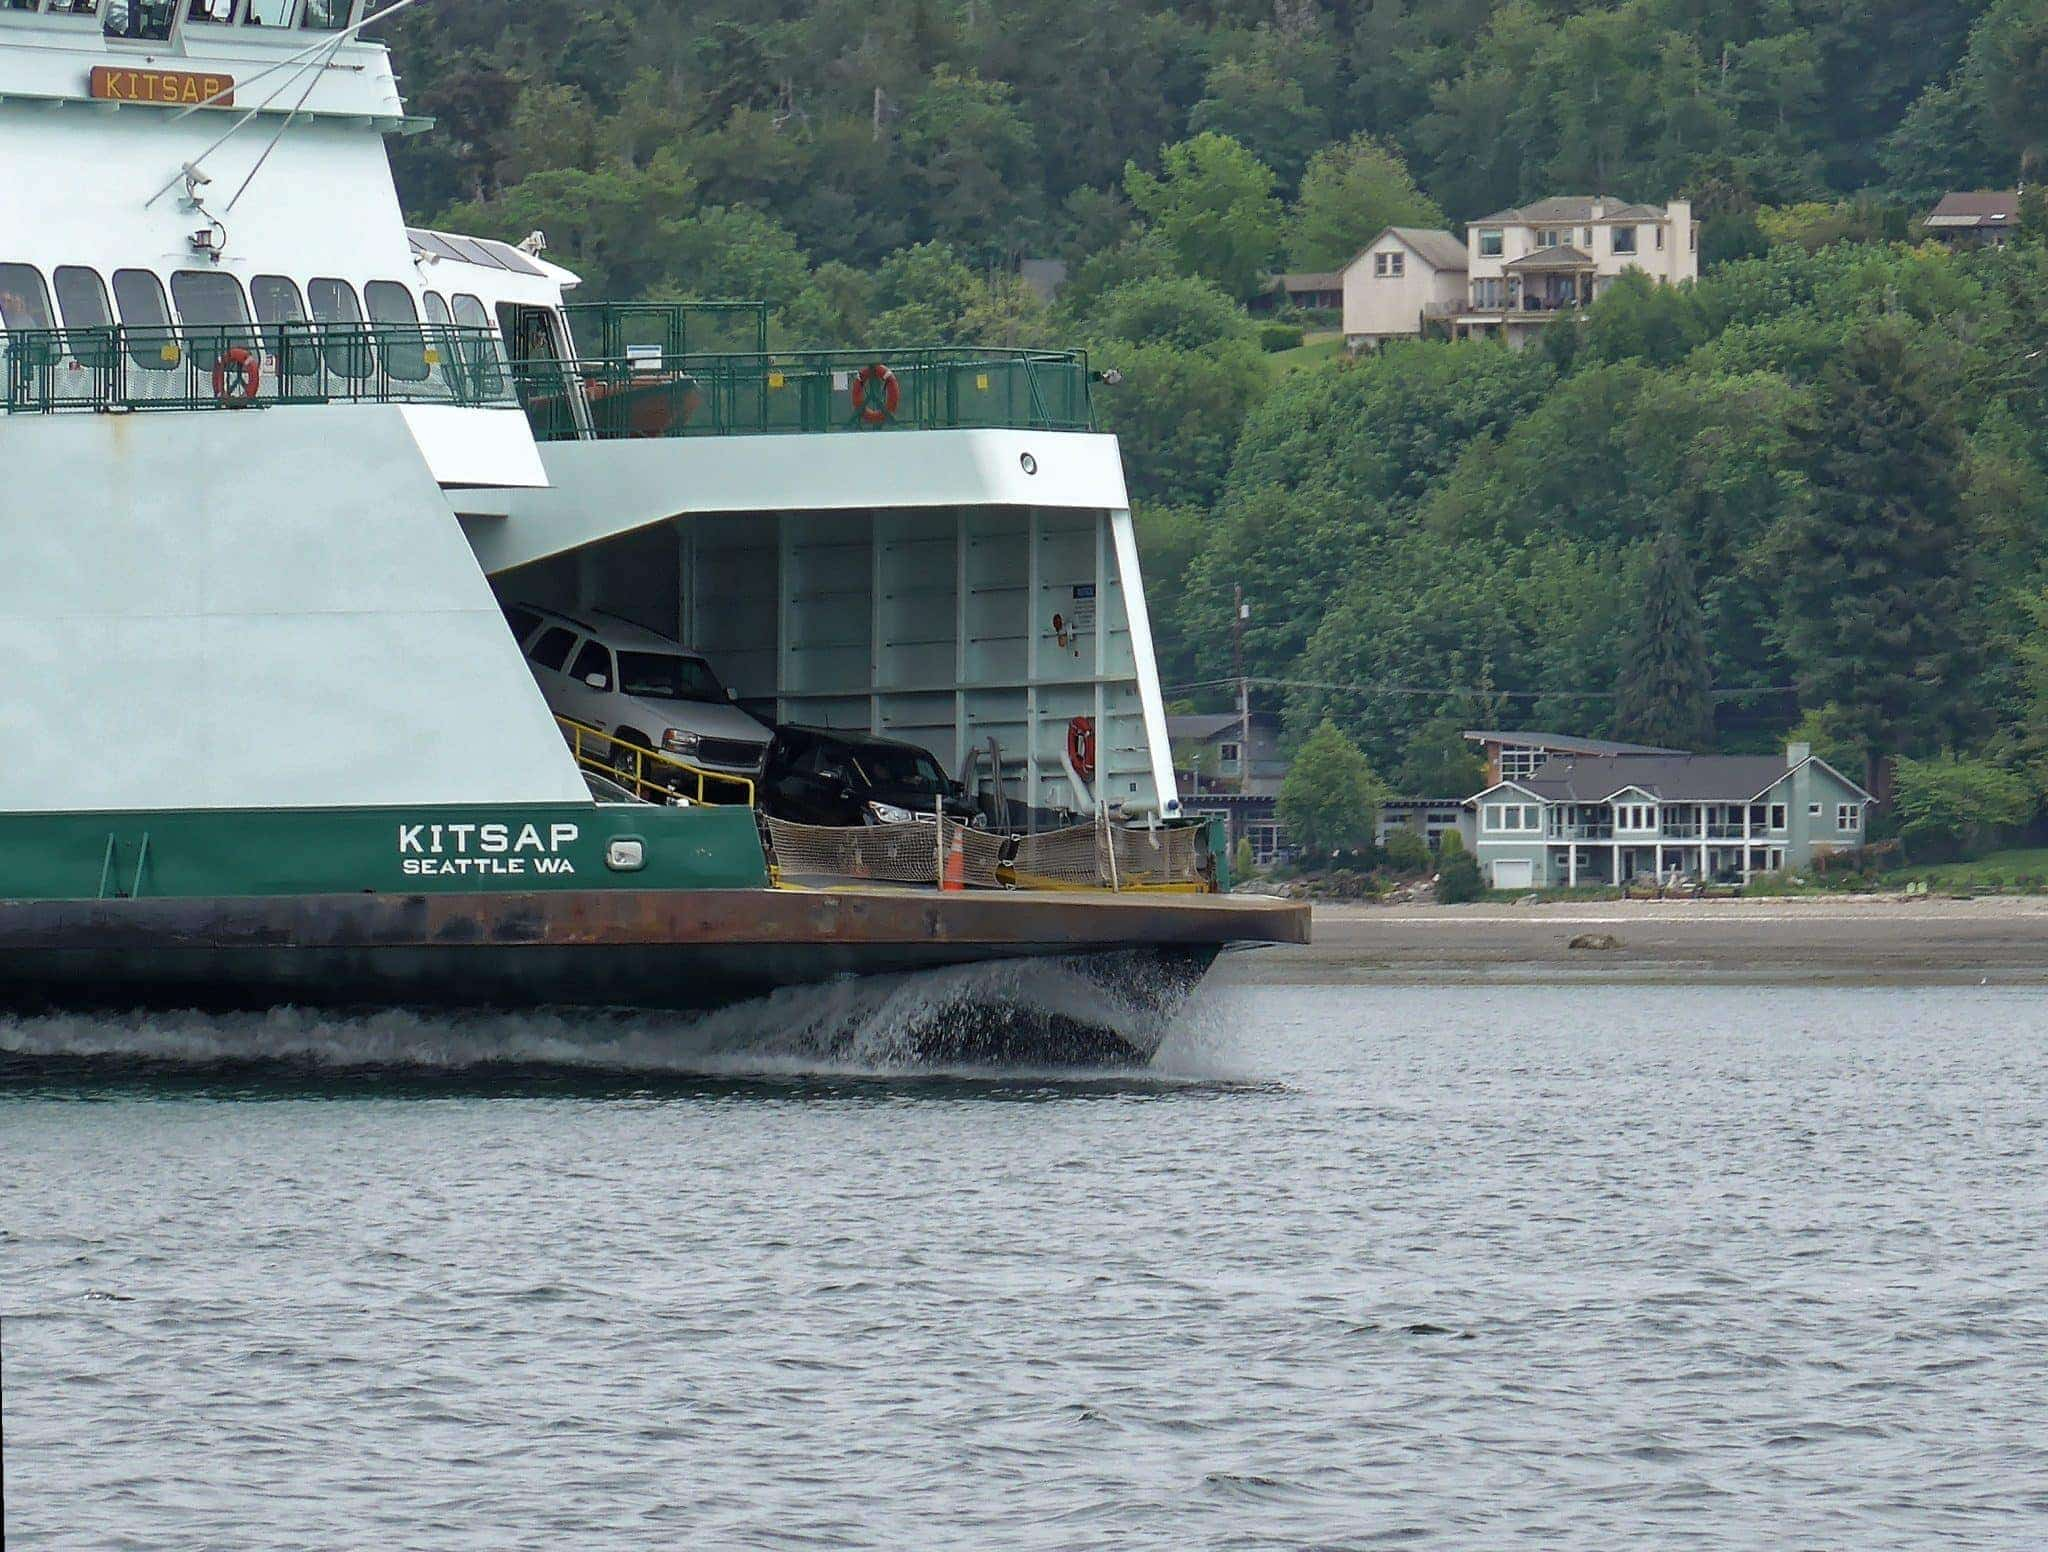 Washington State Ferry Kitsap and it's bow wake headed towards Bremerton